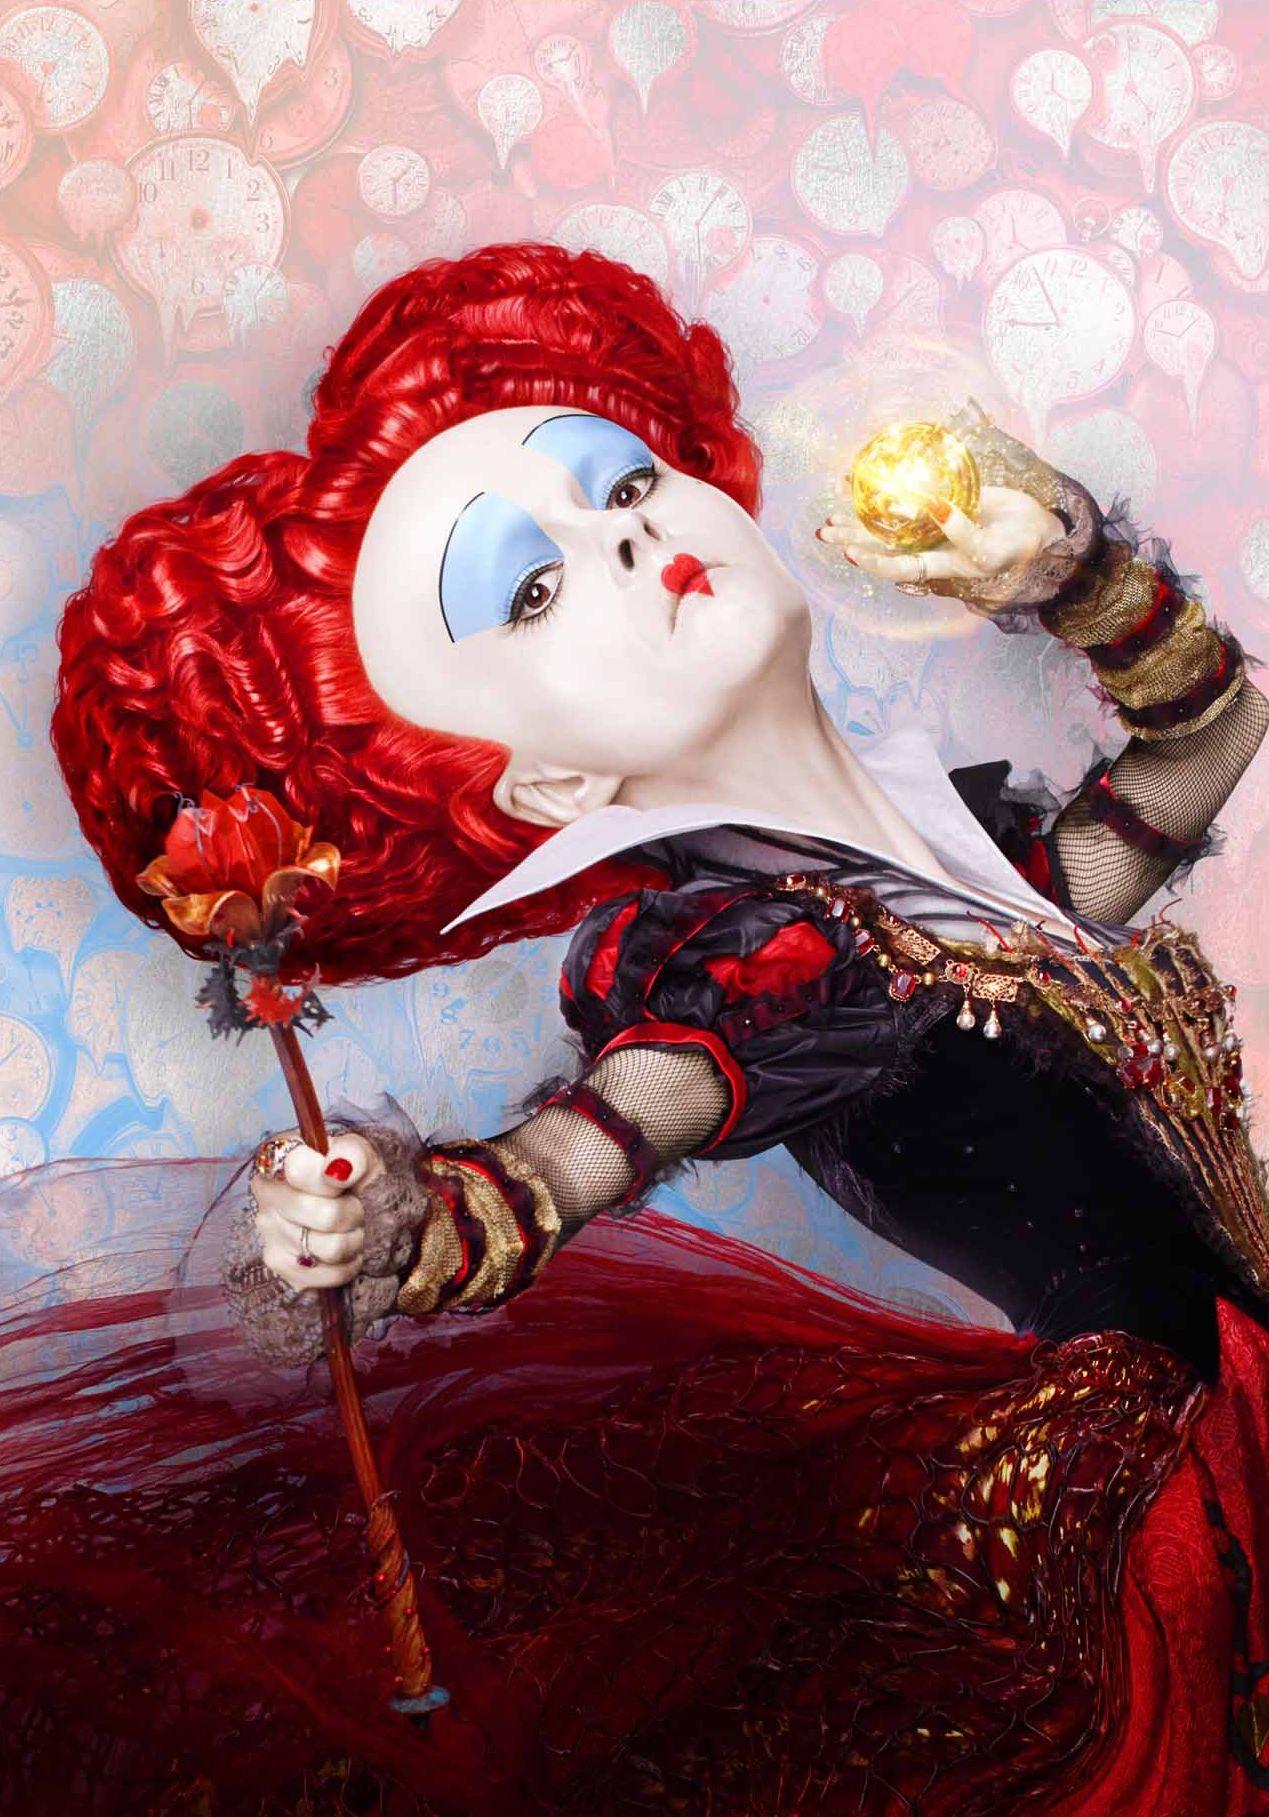 Helena Bonham Carter as the Red Queen